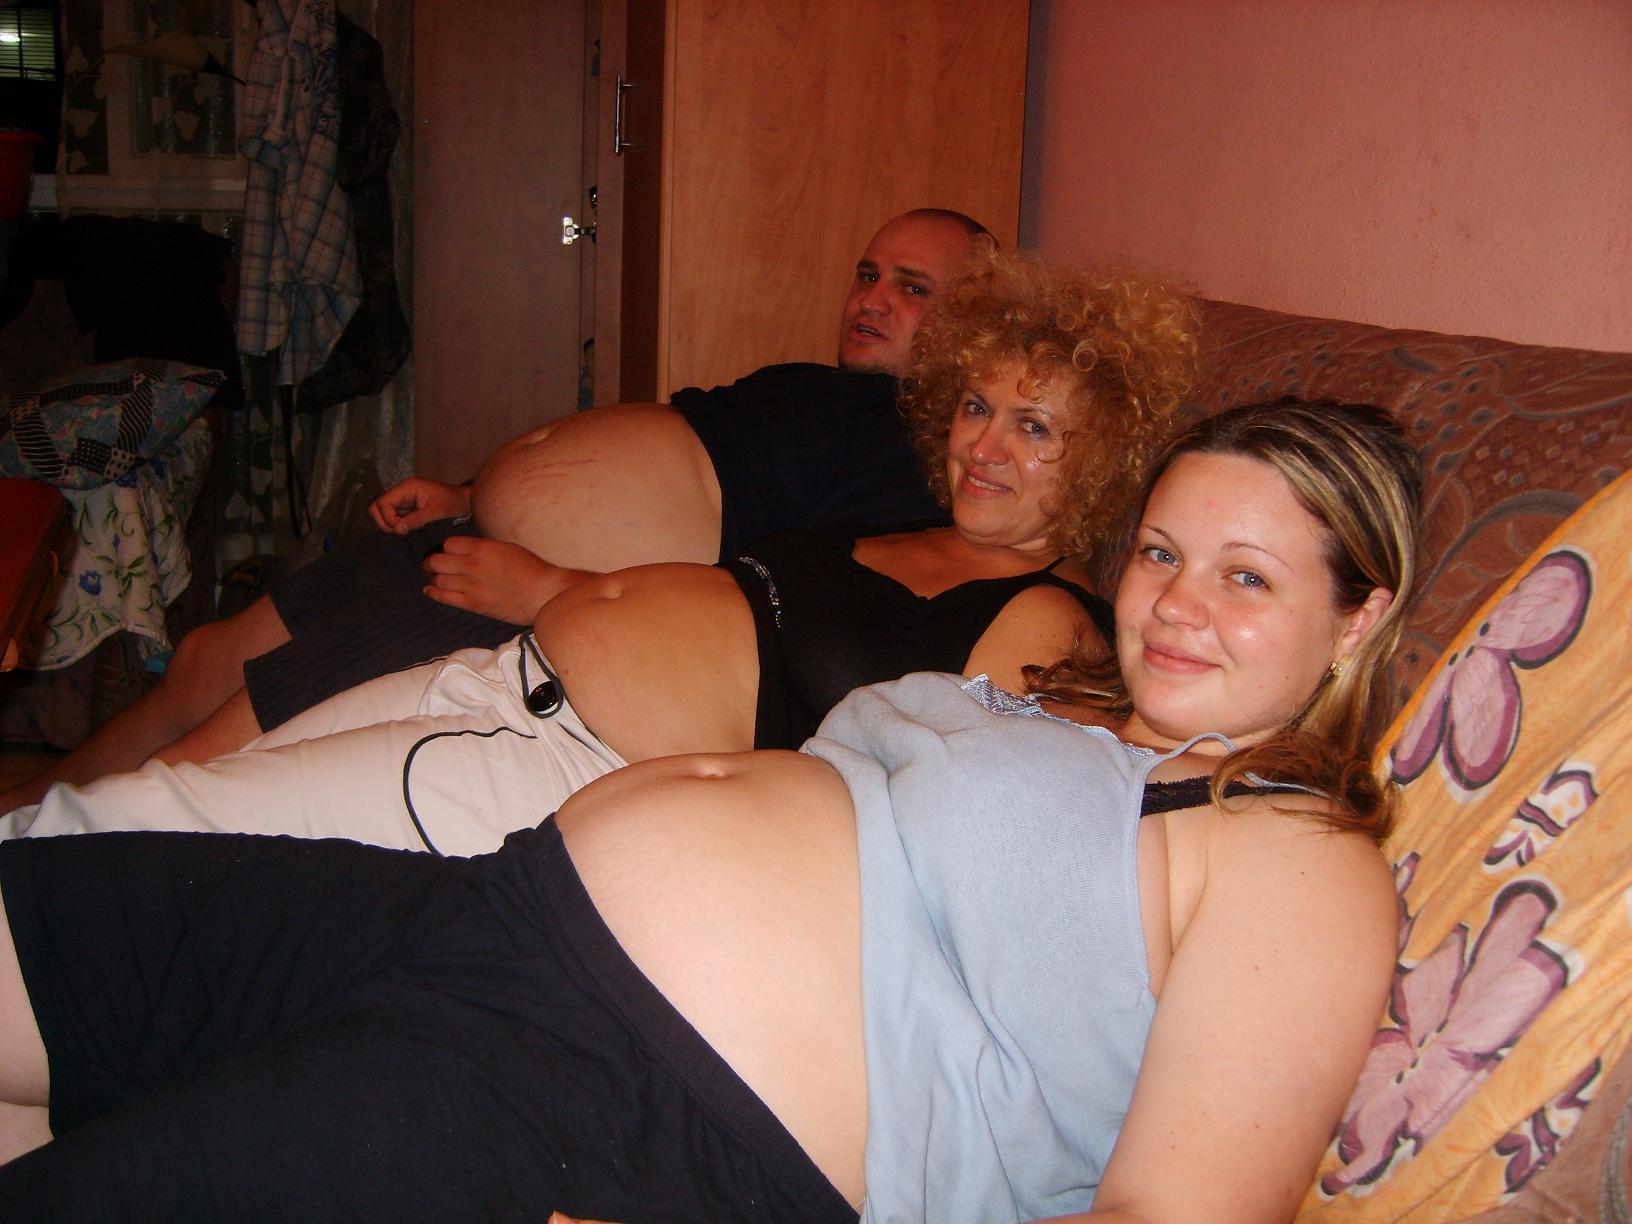 zagadka.... Беременный живот